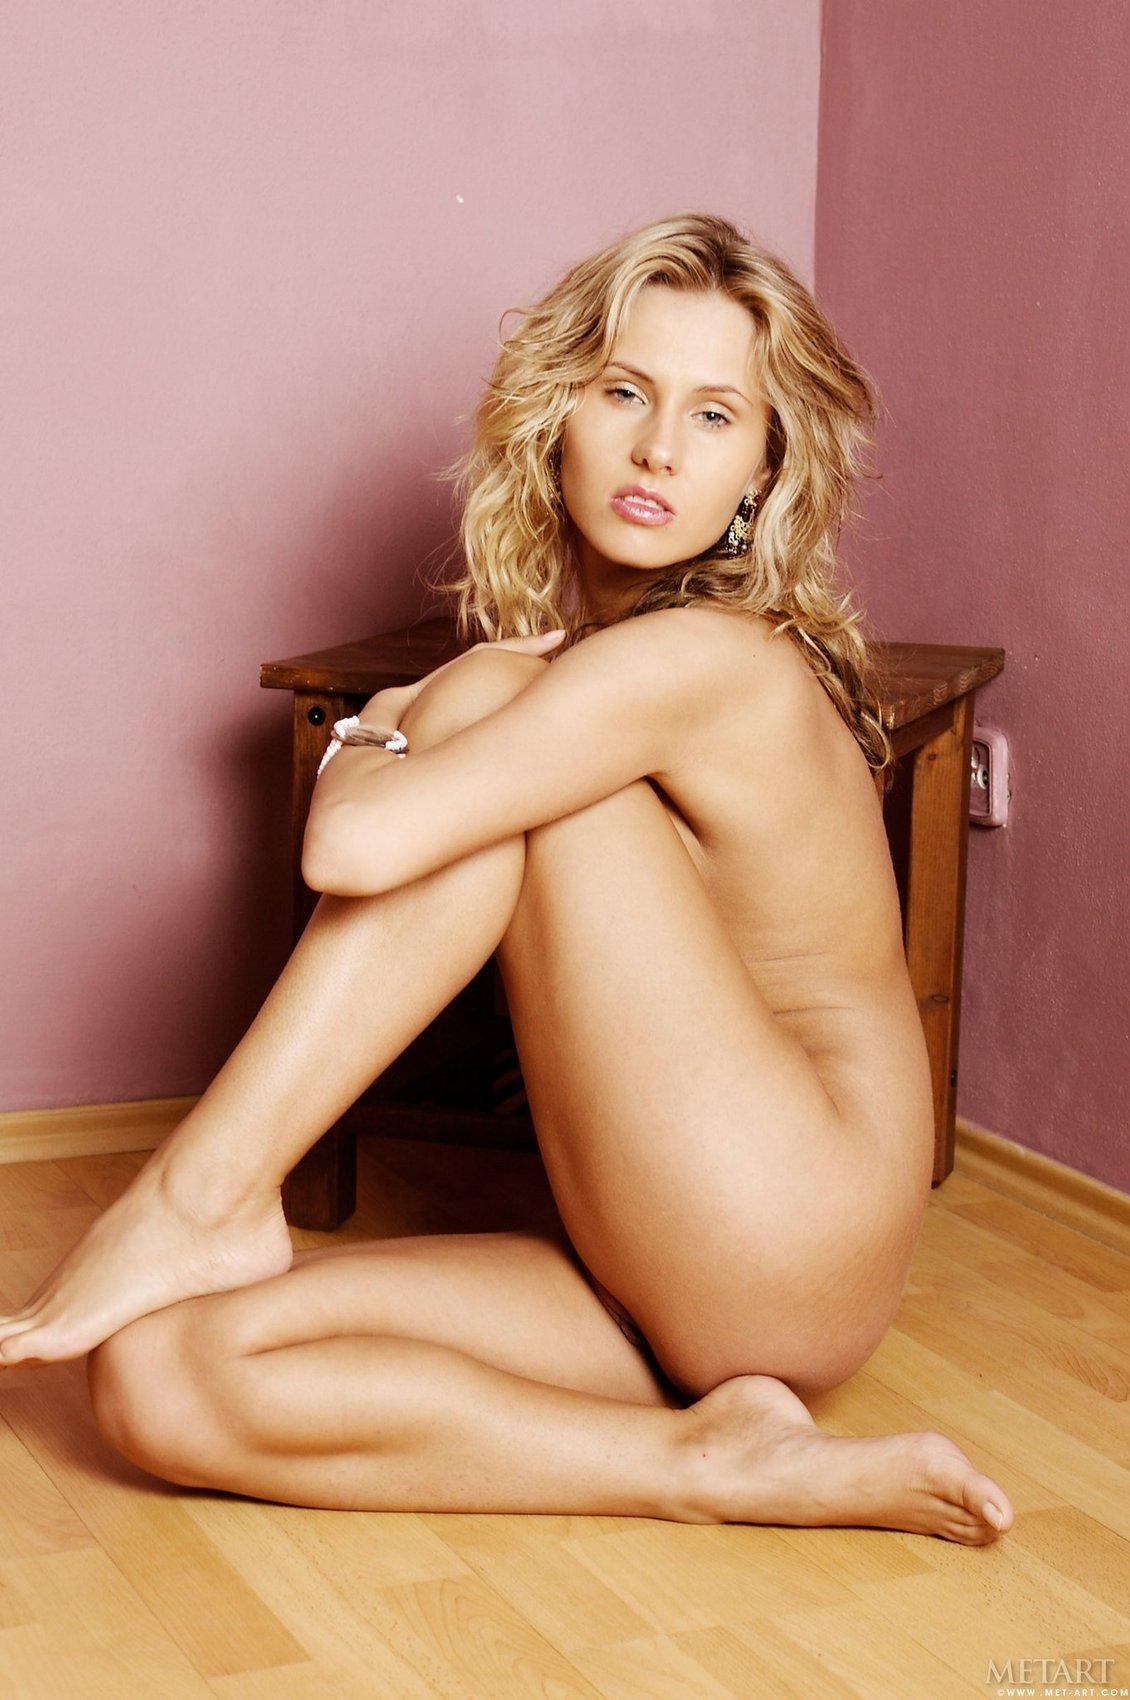 nudes young virgin girls pics